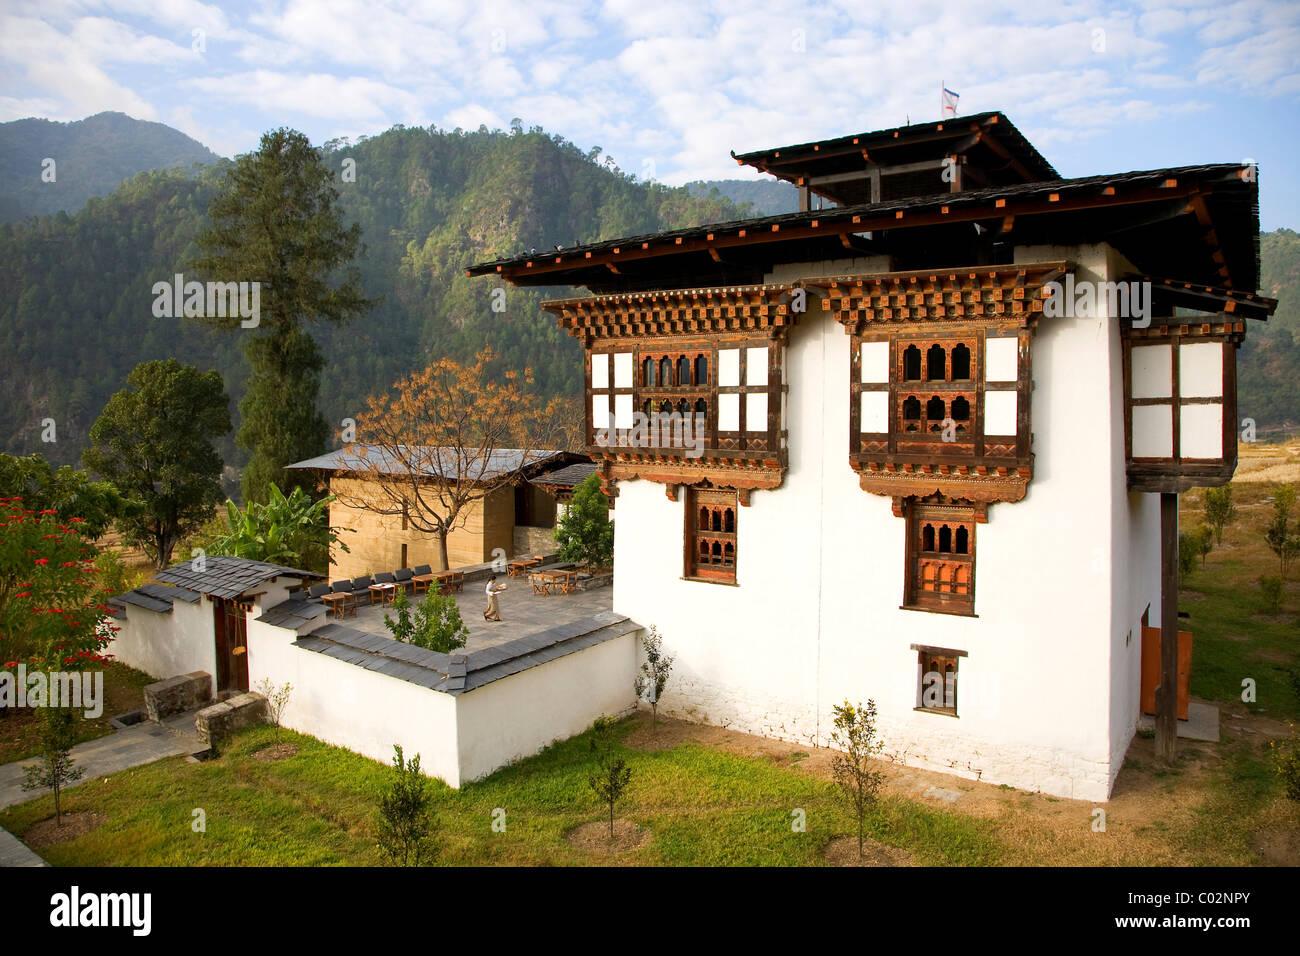 Amankora Hotel, Punakha, Bhutan, Kingdom of Bhutan, South Asia - Stock Image